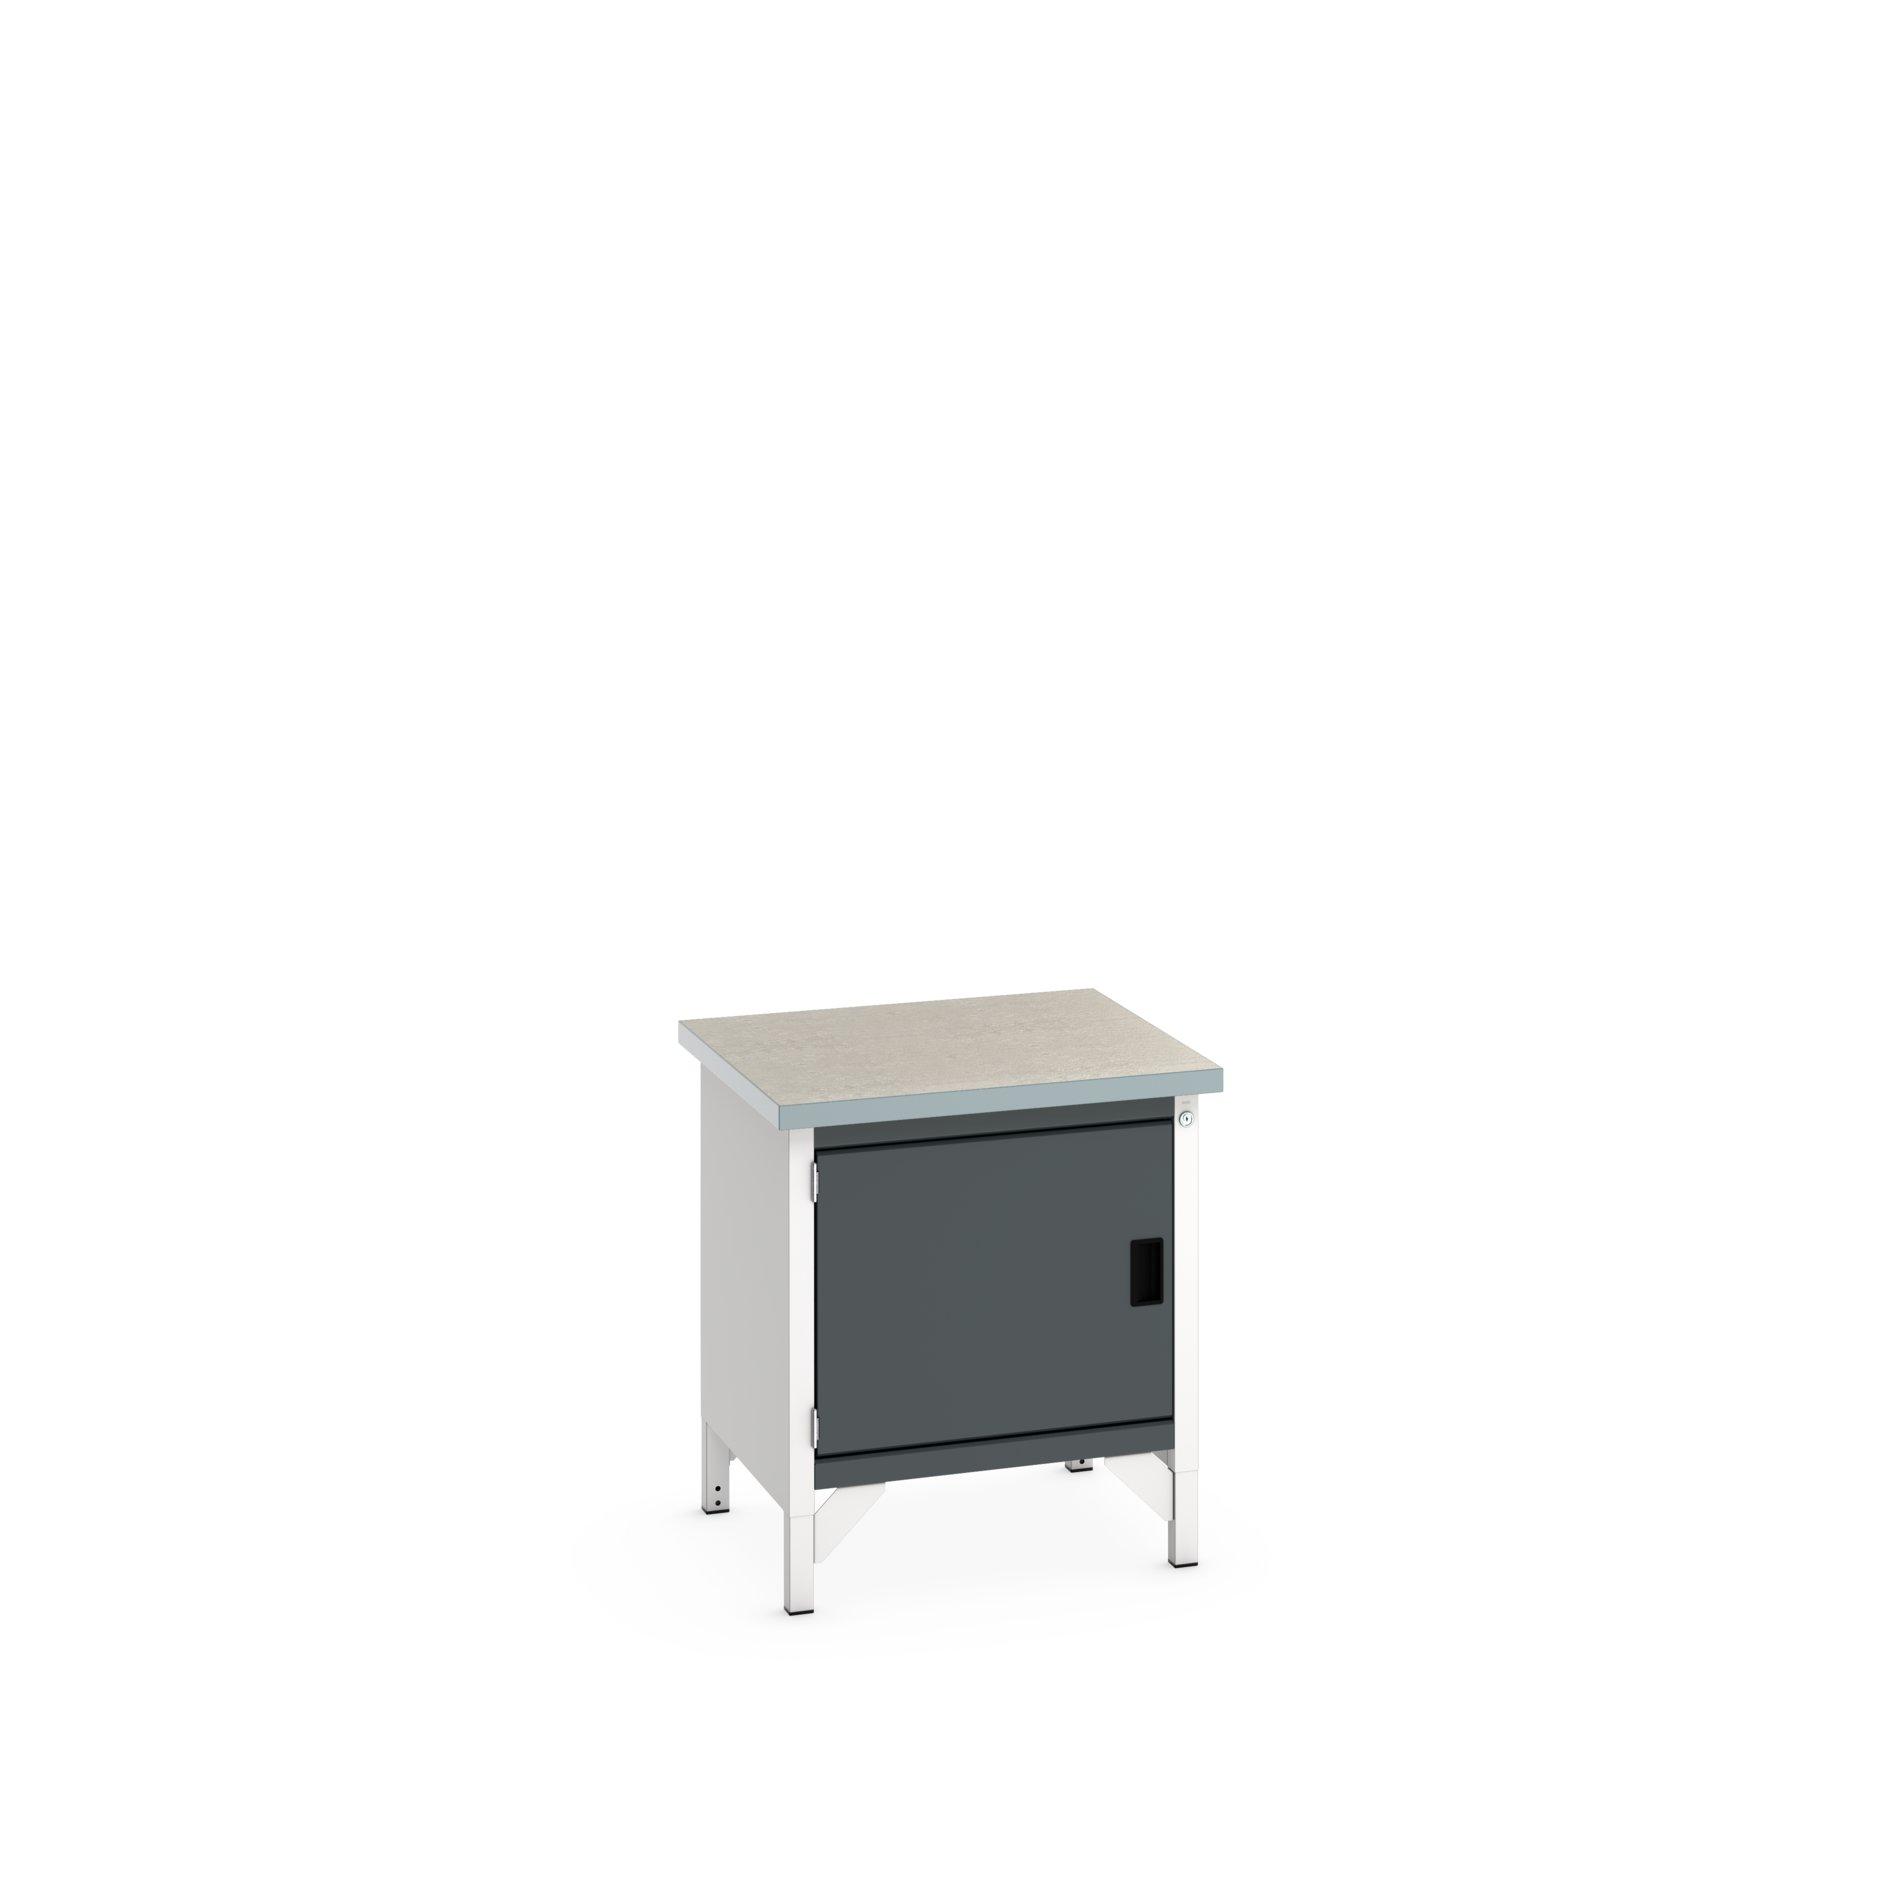 Bott Cubio Storage Bench With Full Cupboard